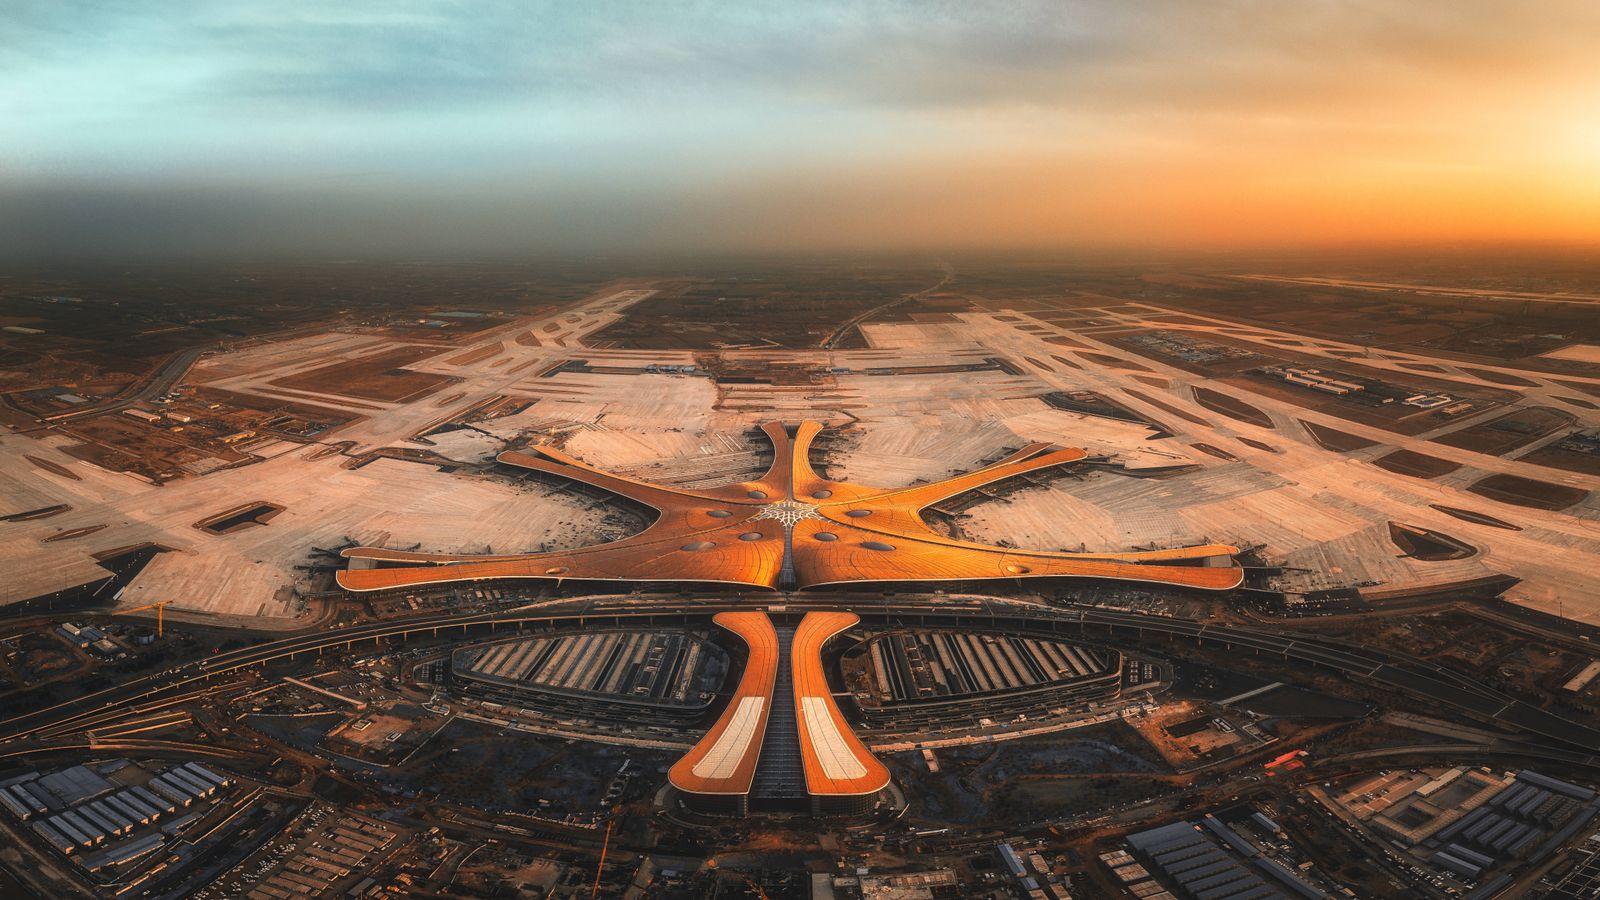 Beijing Daxing Airport Aerial Photograph PUBLICATIONxNOTxINxCHN 637061014335652019